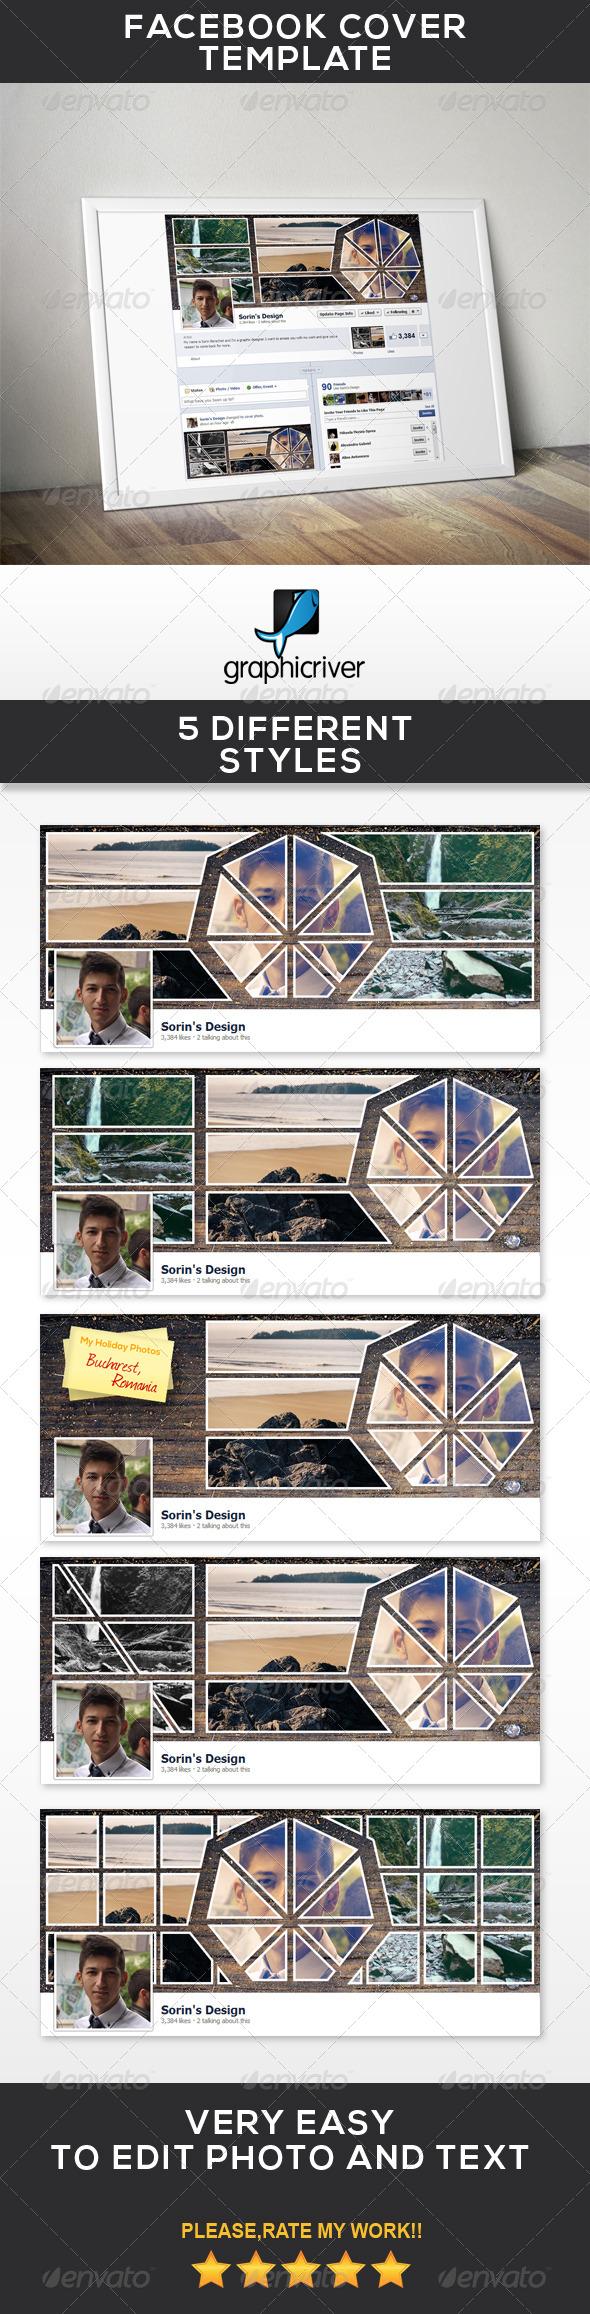 GraphicRiver Facebook Cover Template Vol.I 7010987